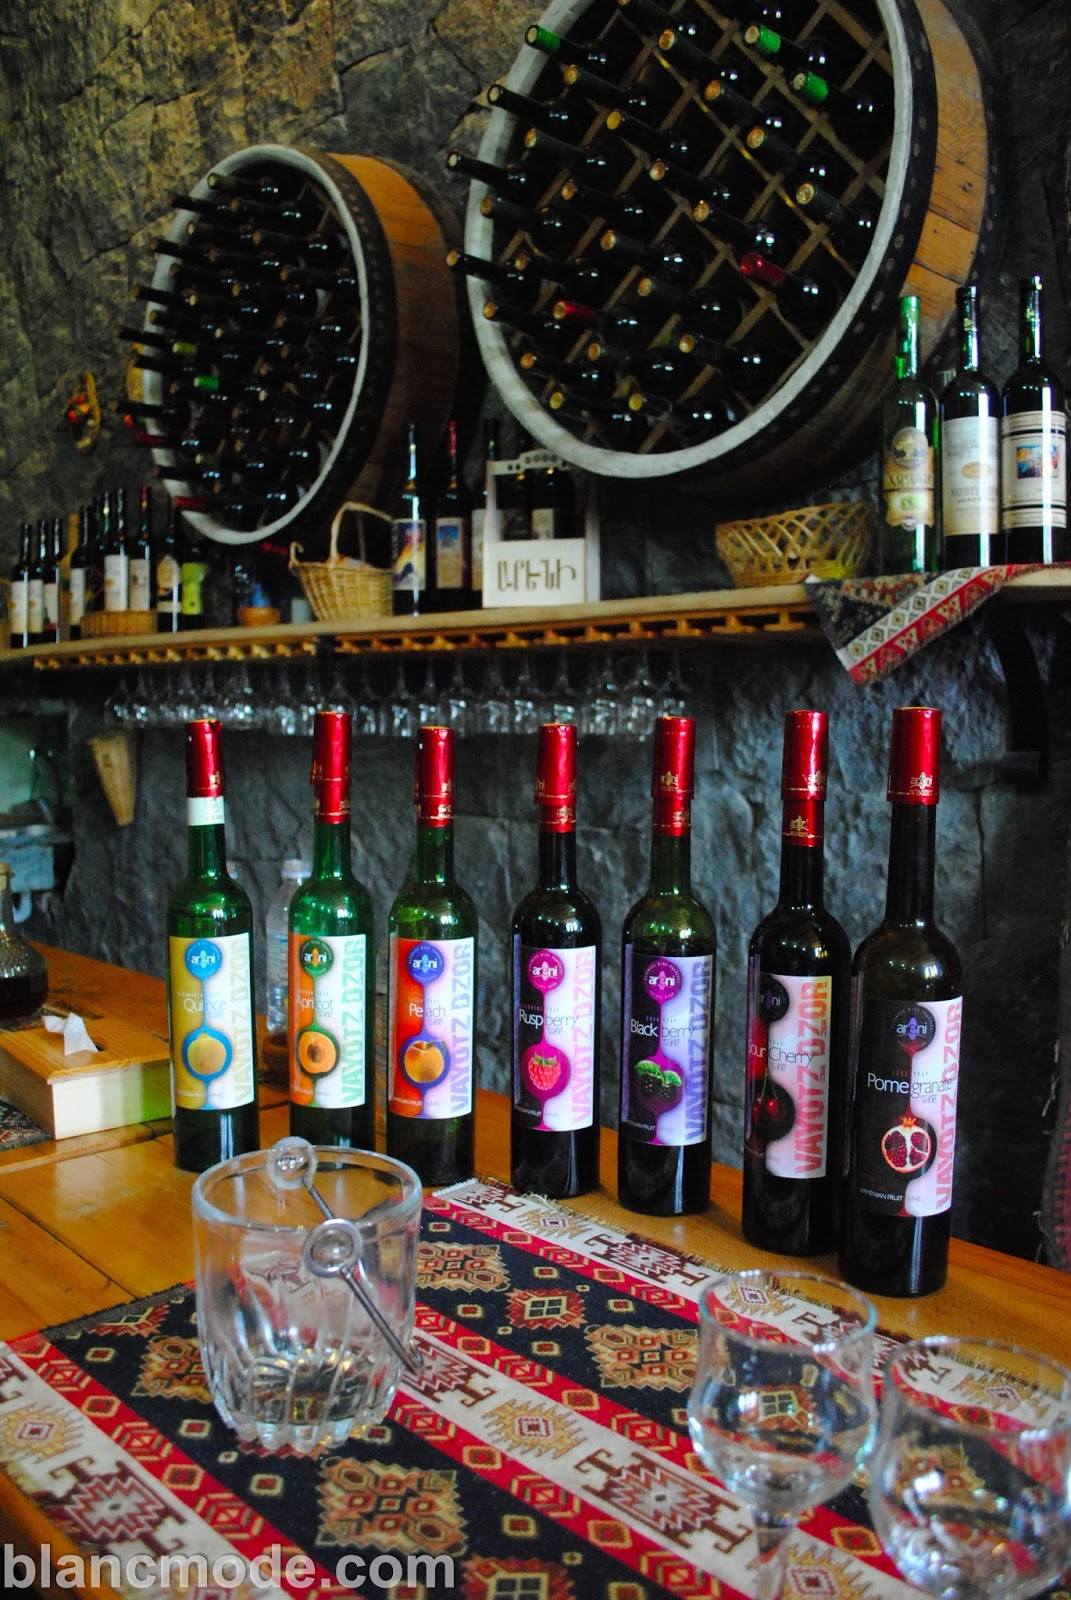 areni winery wine tasting